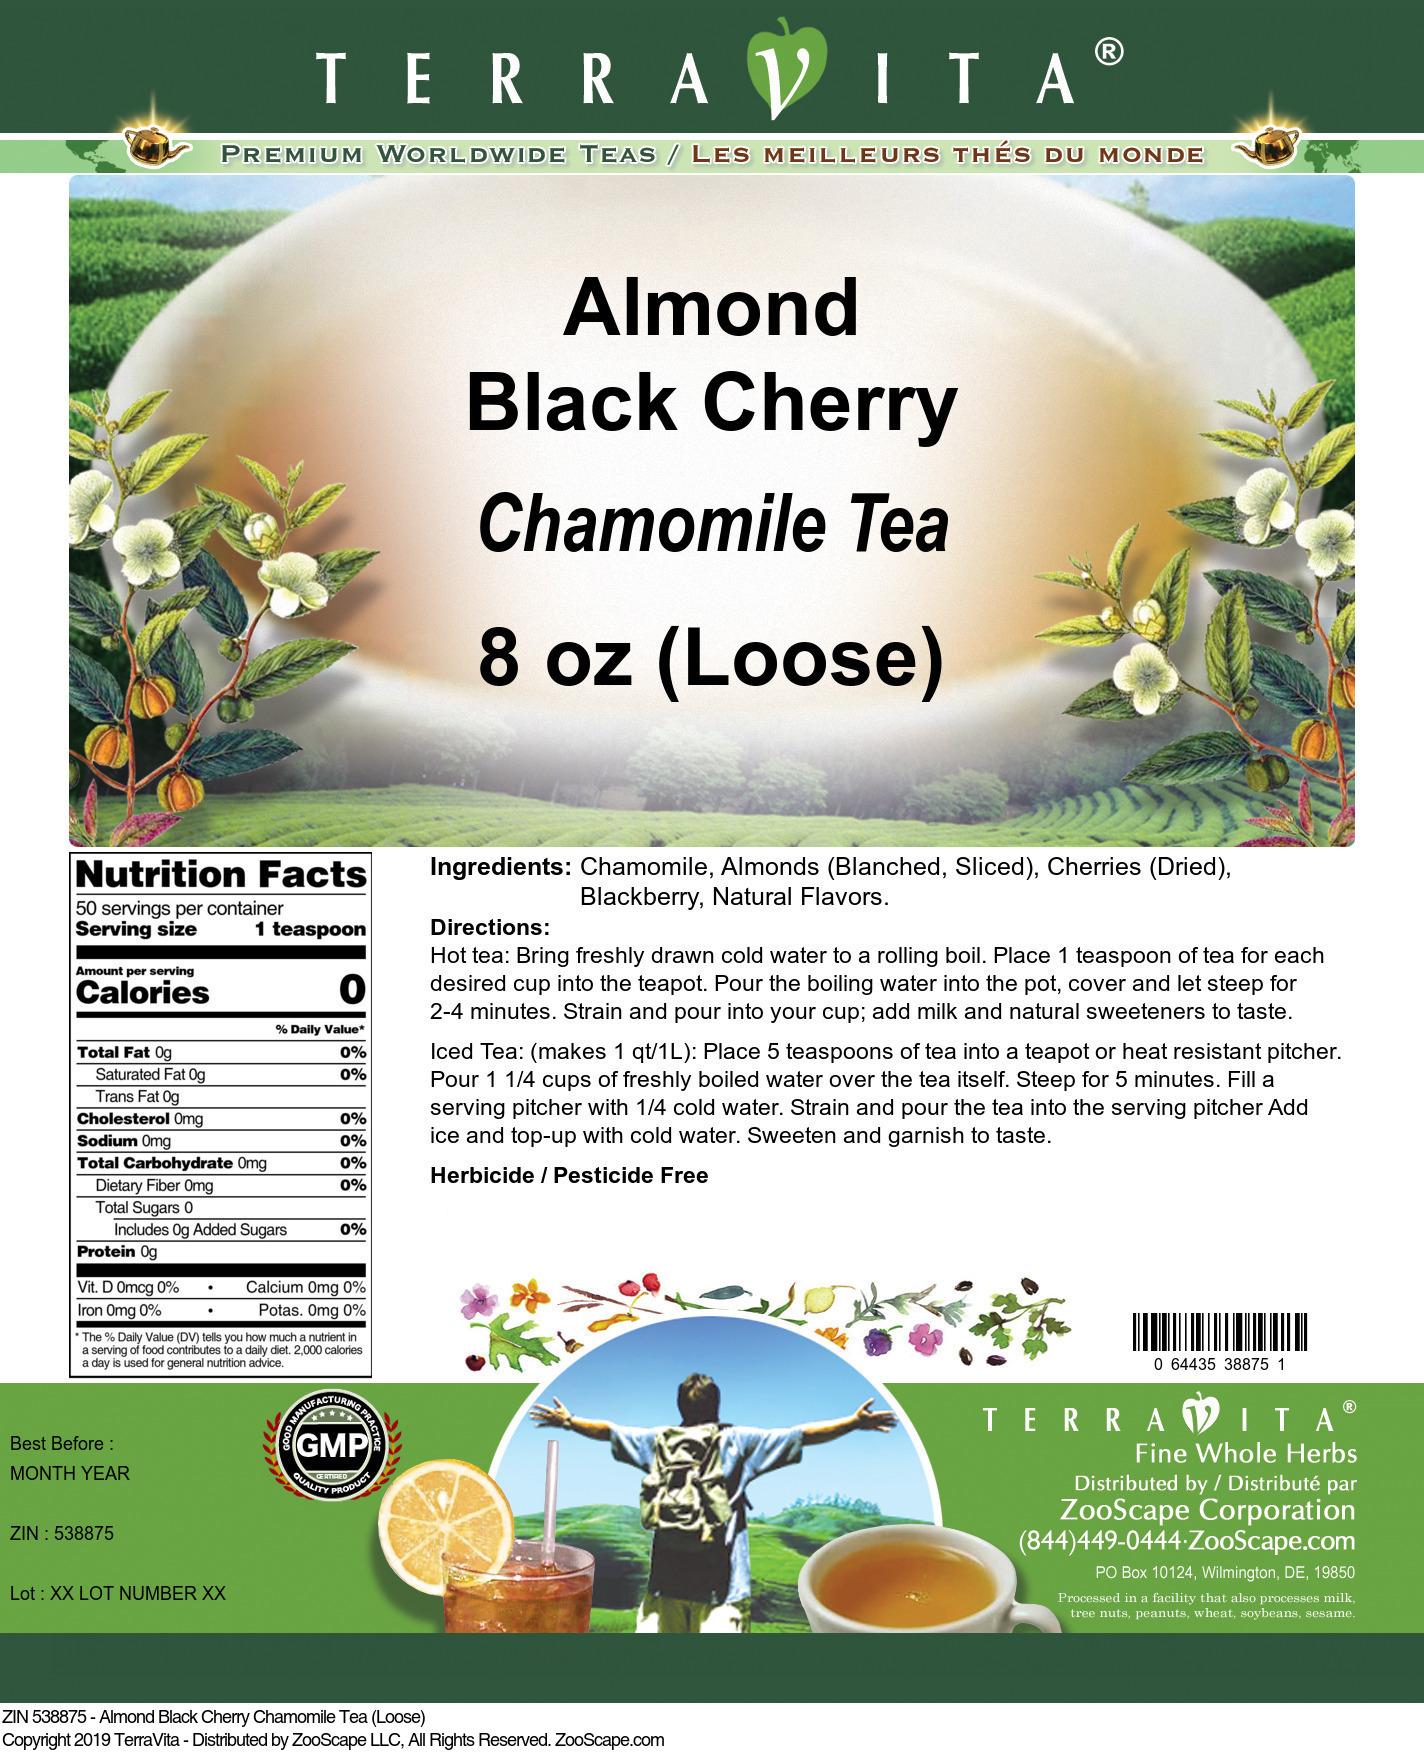 Almond Black Cherry Chamomile Tea (Loose)